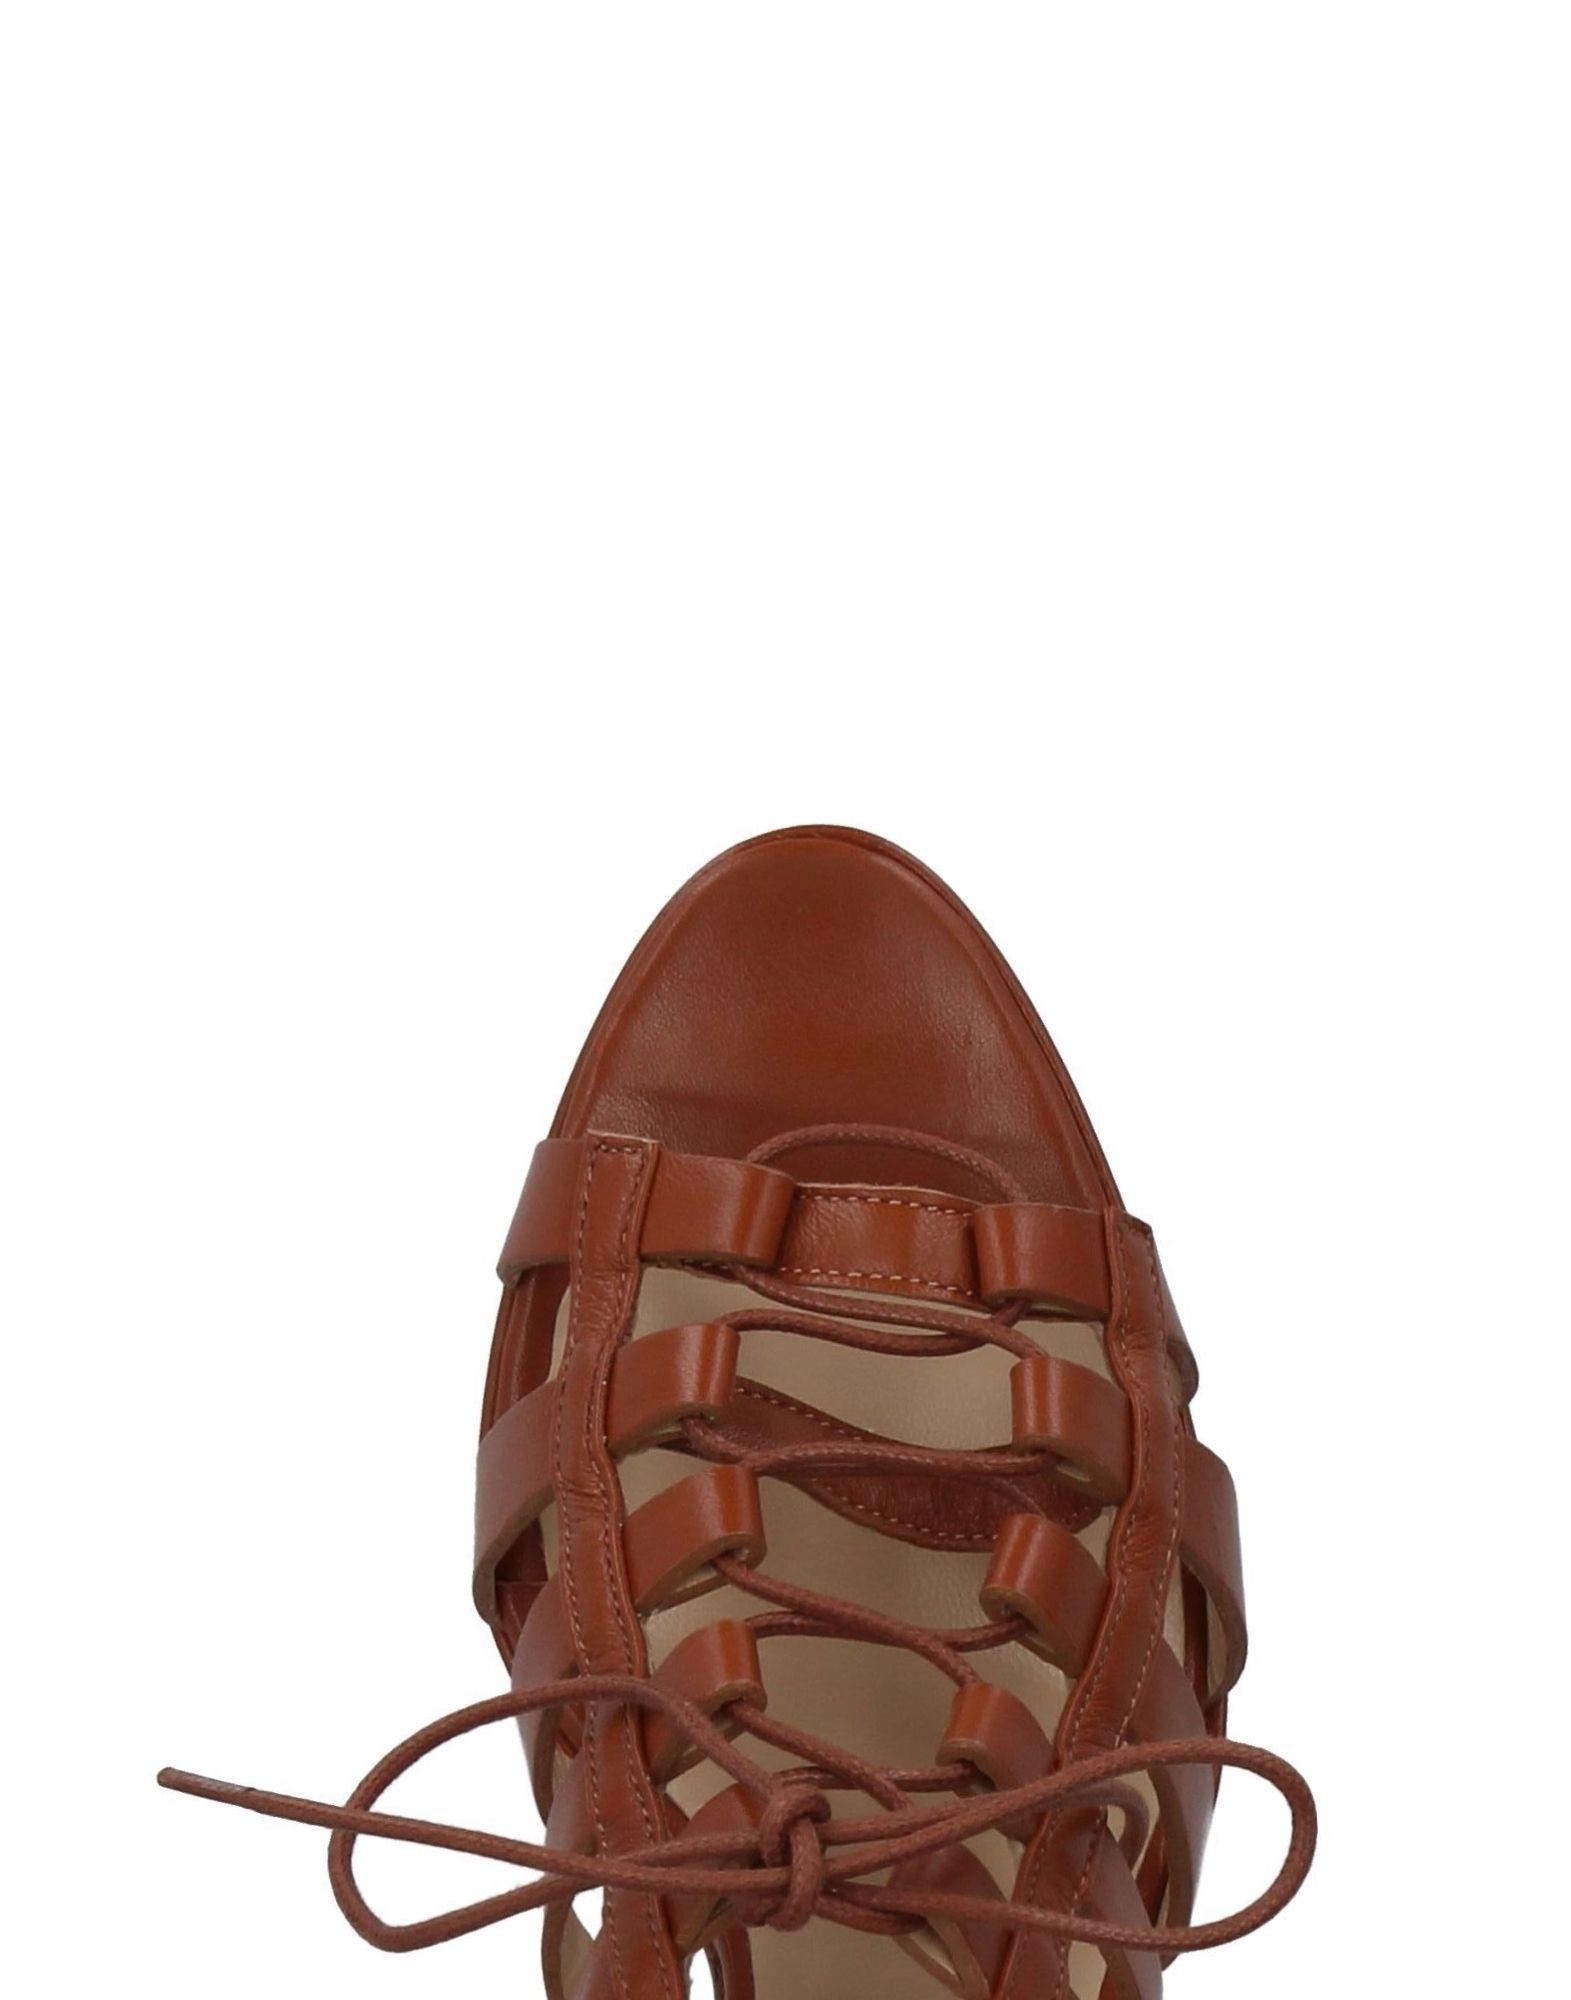 Franco Colli Sandalen Damen  11408944RV 11408944RV  Gute Qualität beliebte Schuhe 4acfd1